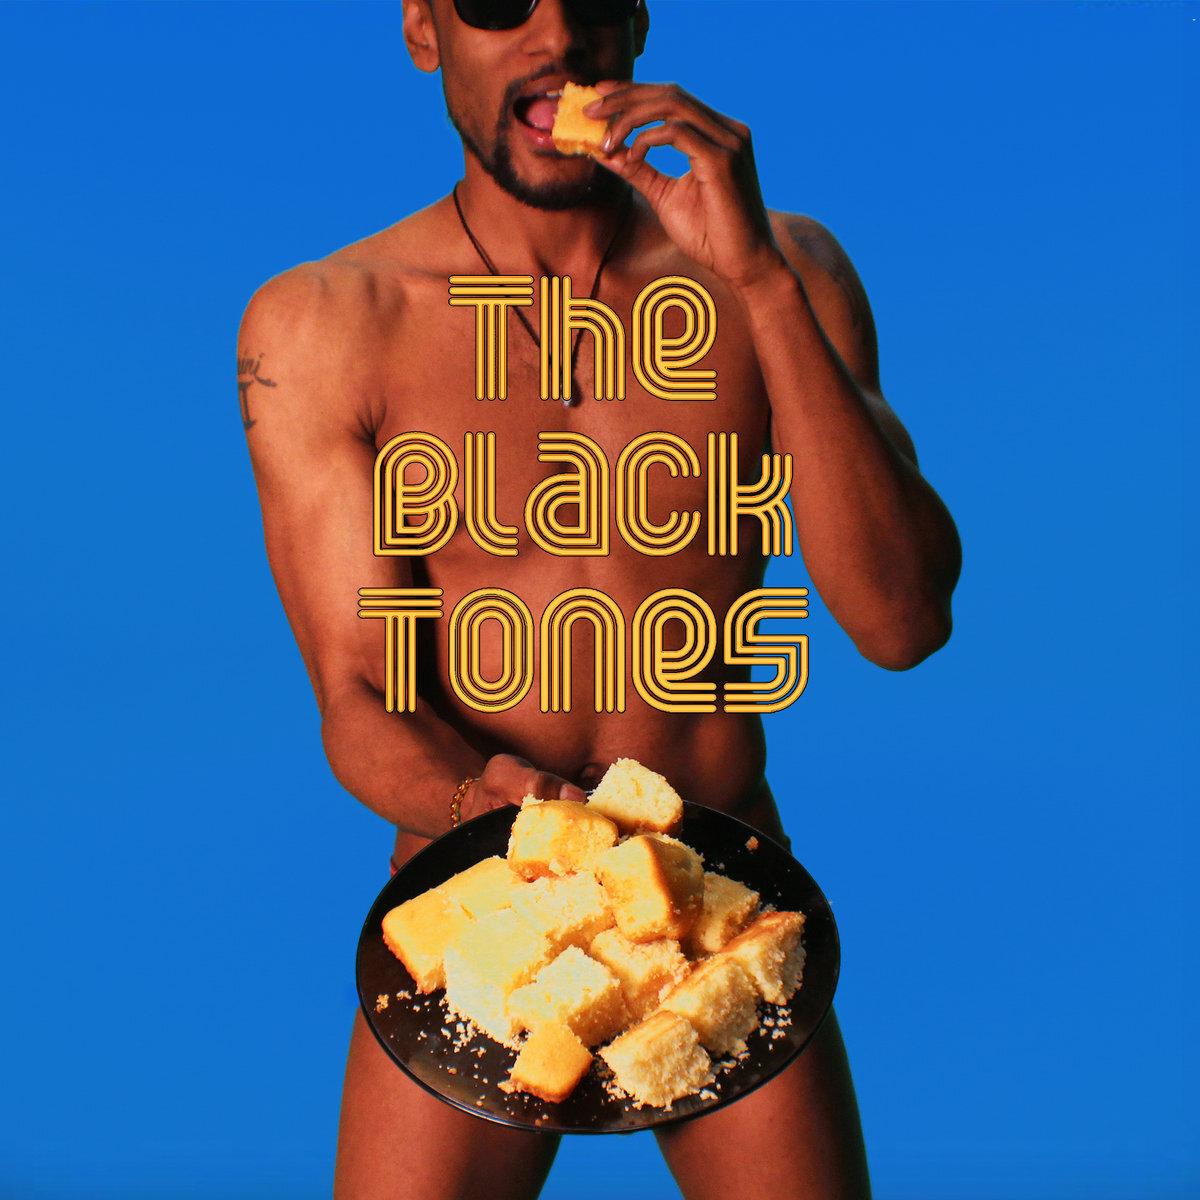 The Black Tones - Cobain & Cornbread